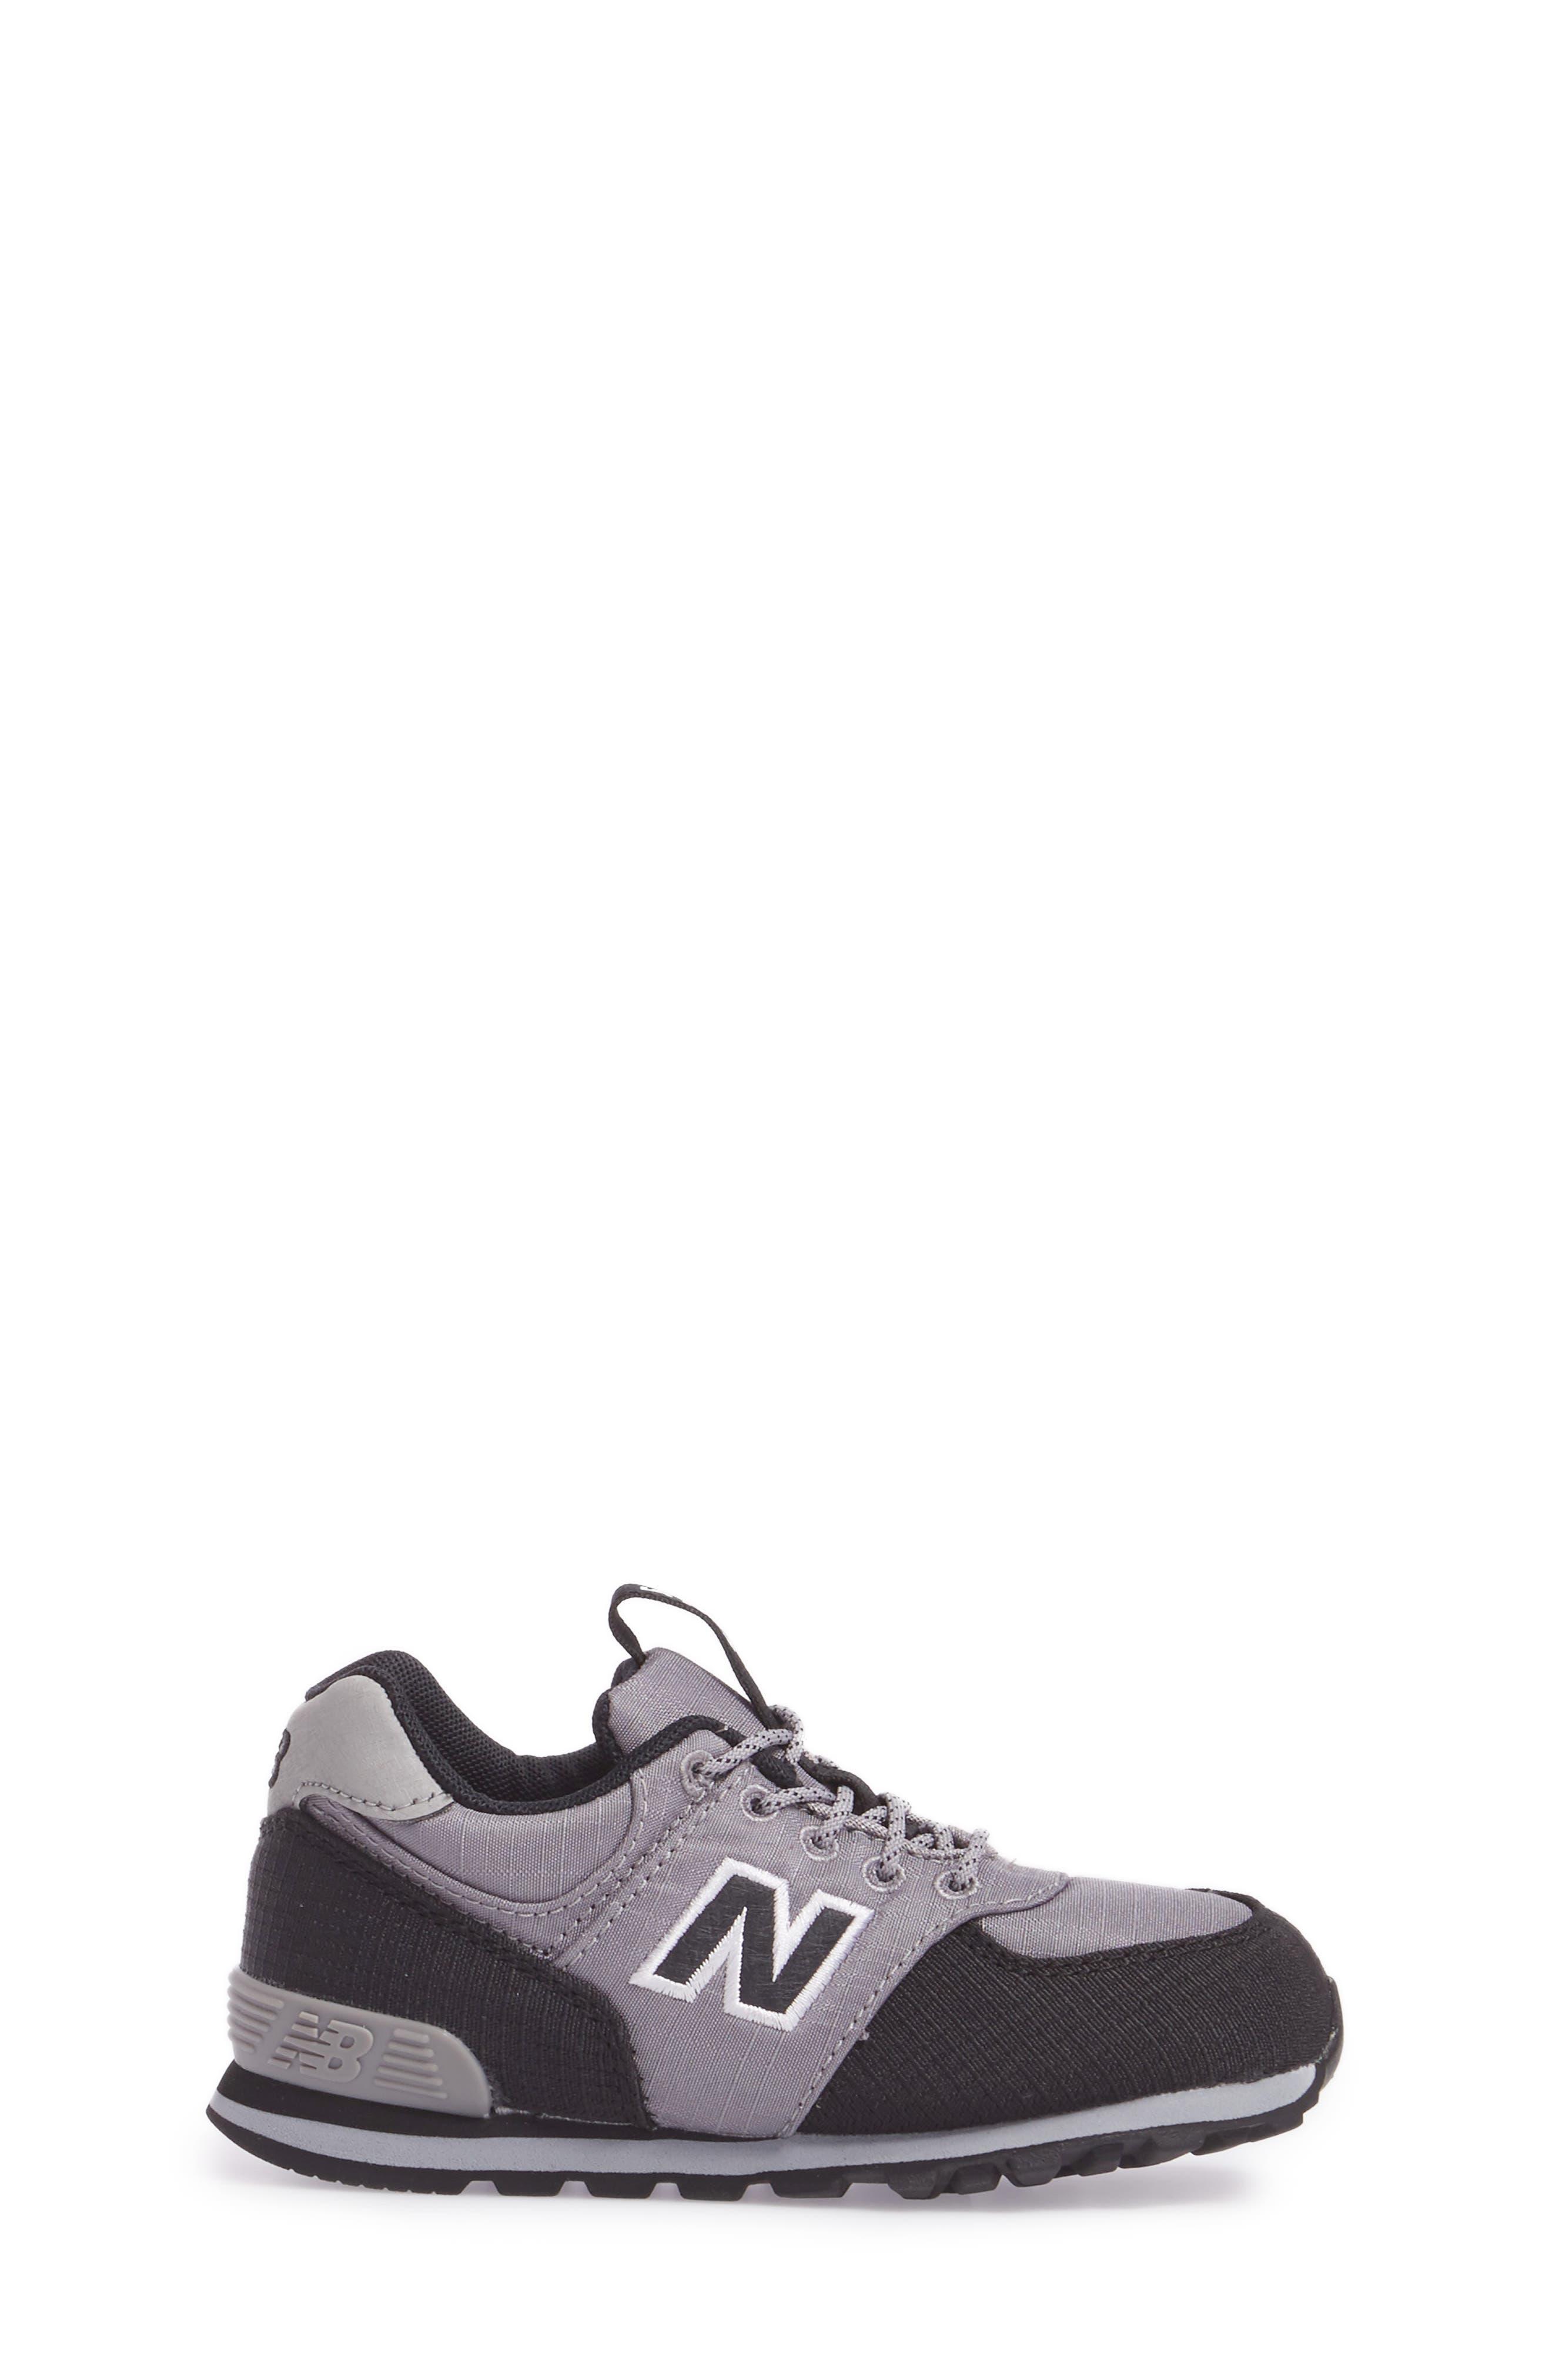 Alternate Image 3  - New Balance 990 Sneaker (Baby, Walker & Toddler)